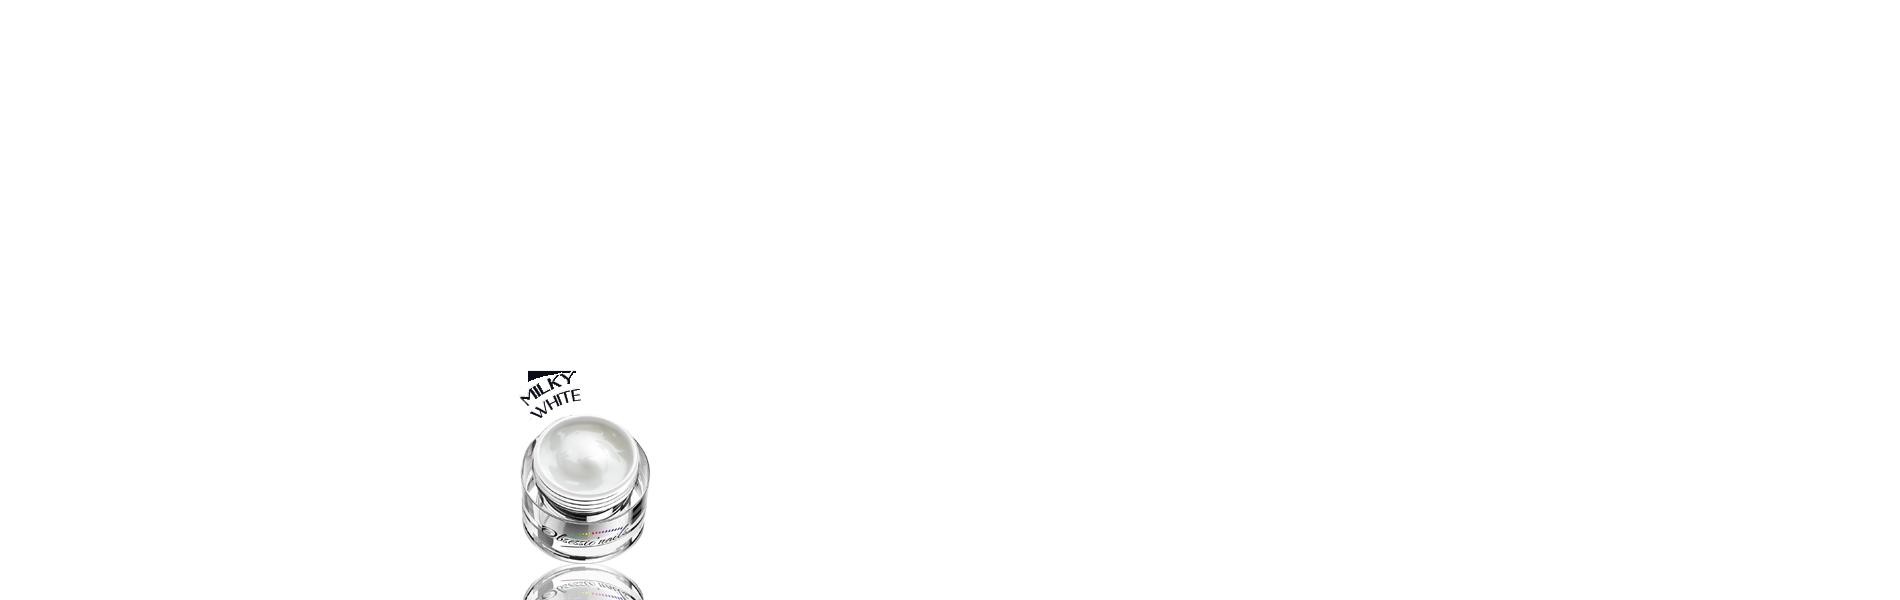 6-Acrylgel-Fond